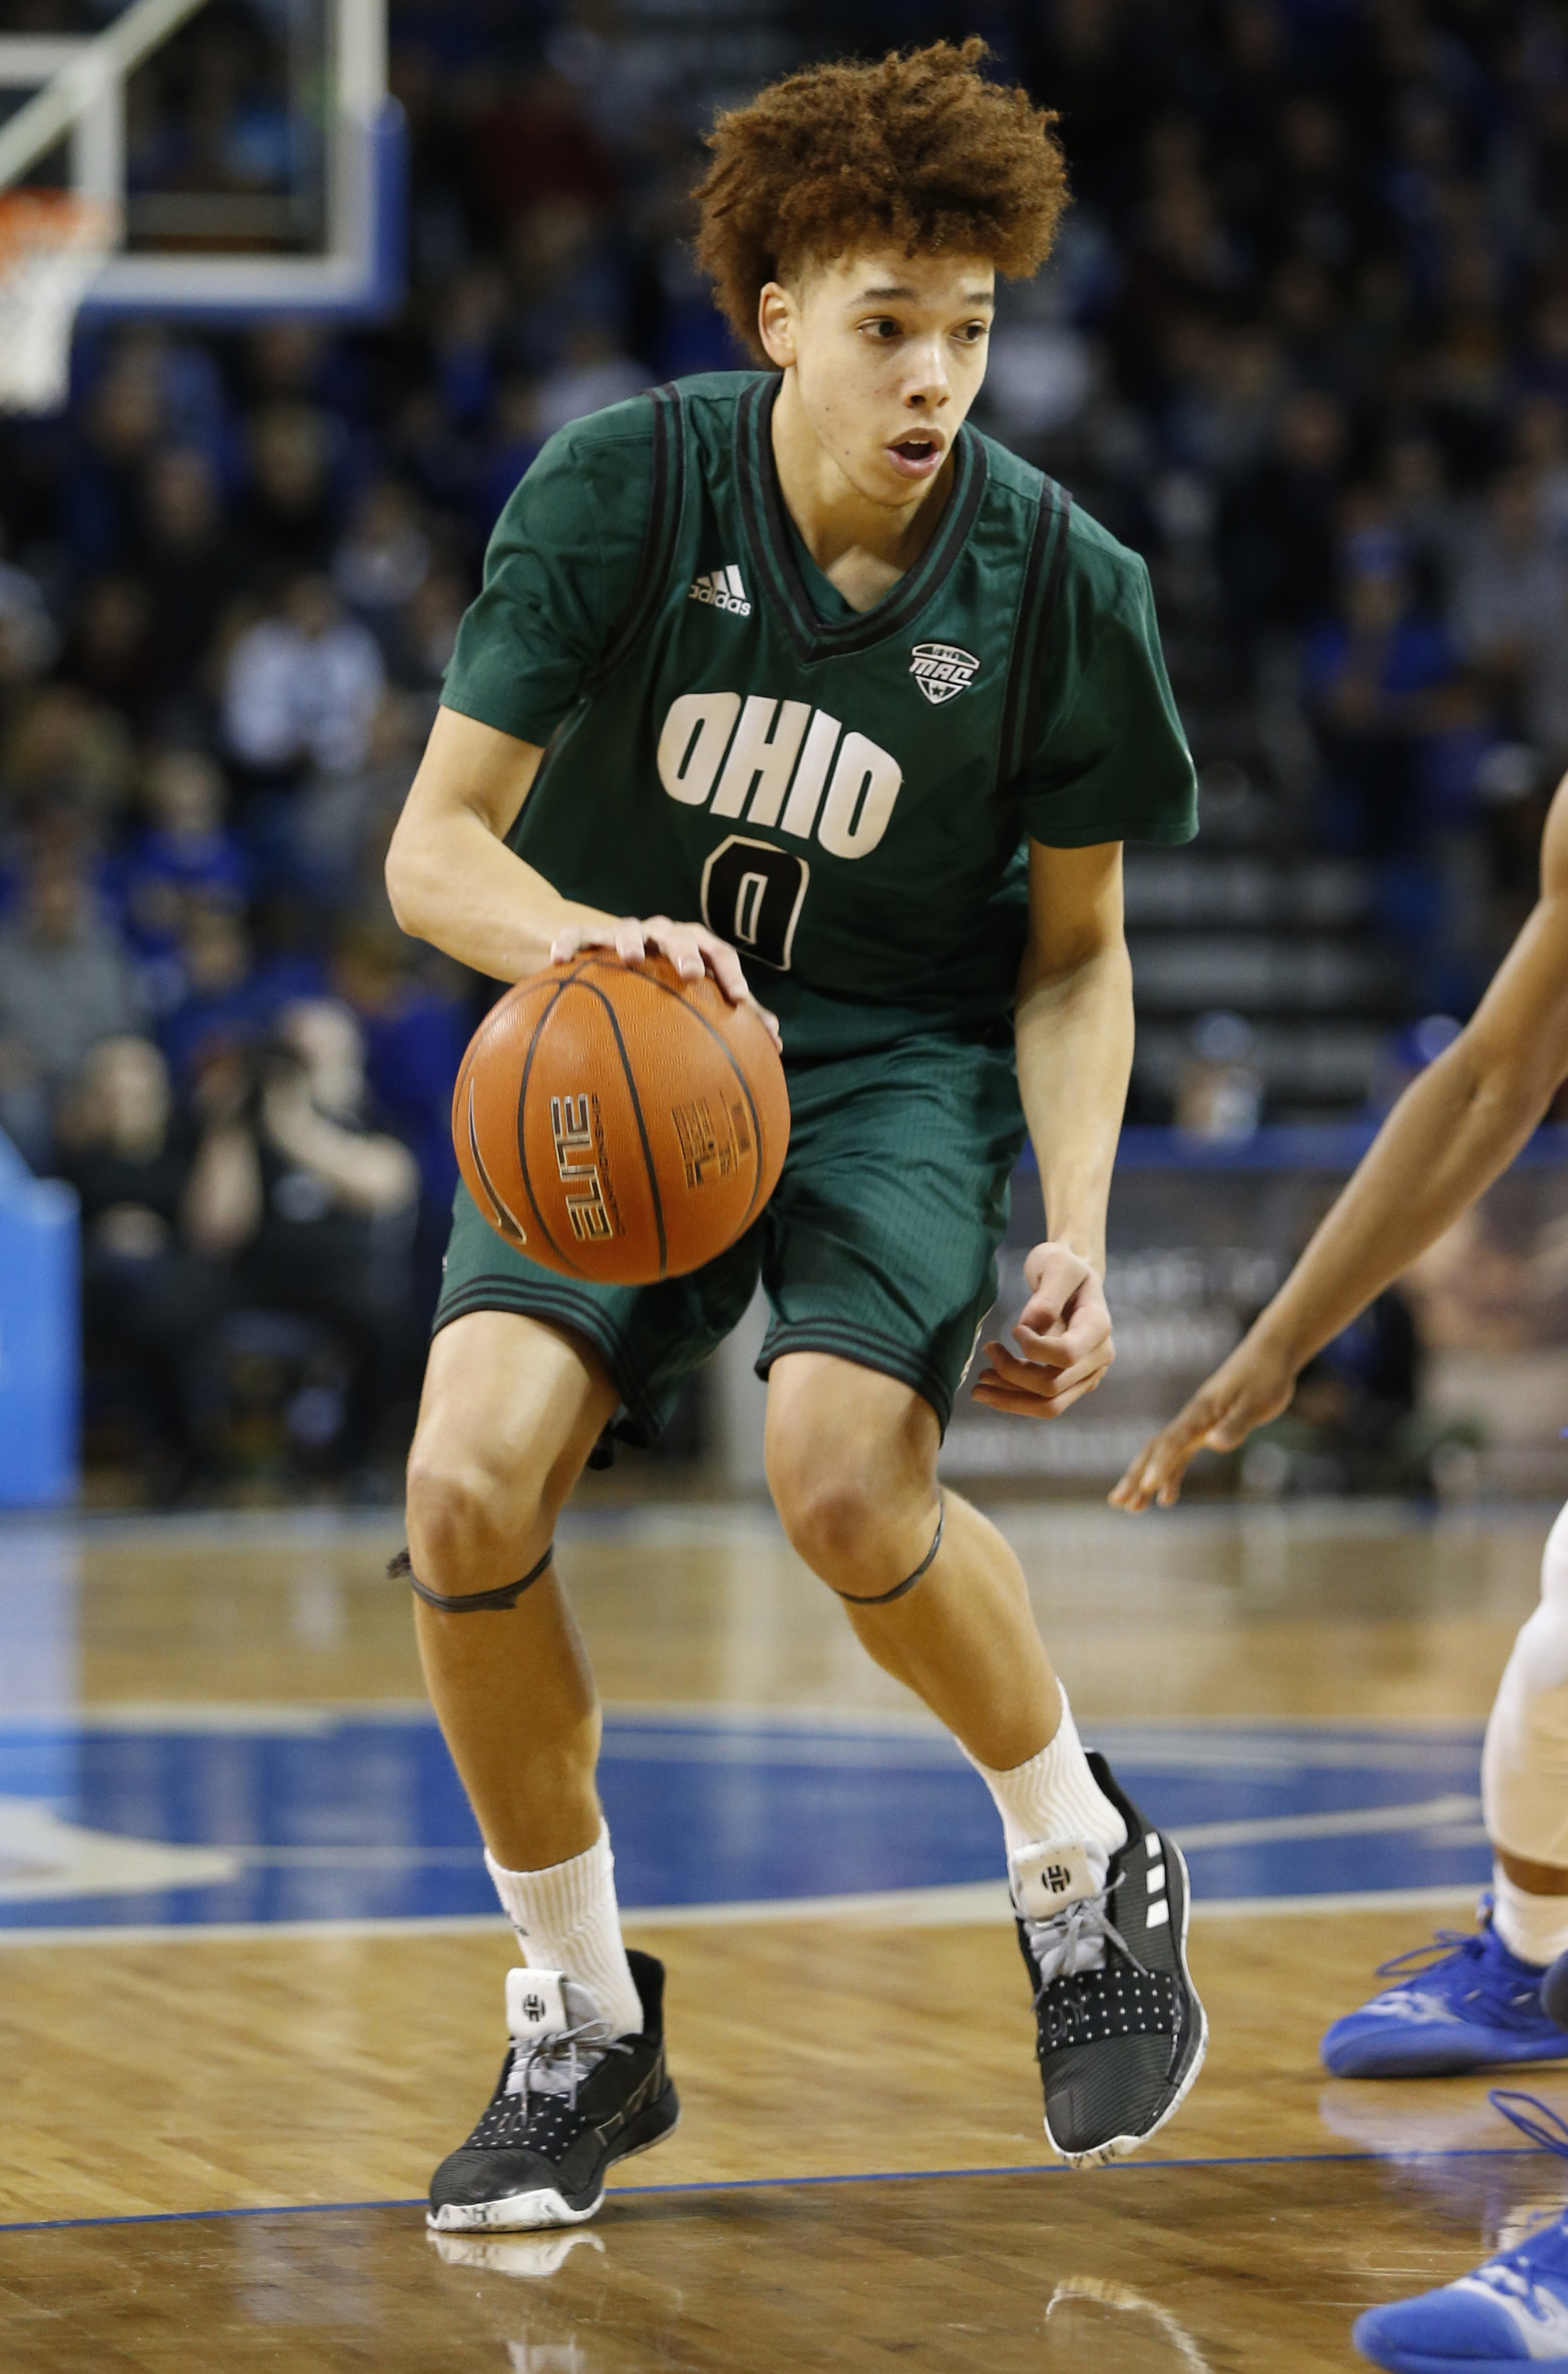 NCAA篮球比赛:俄亥俄州立大学布法罗分校